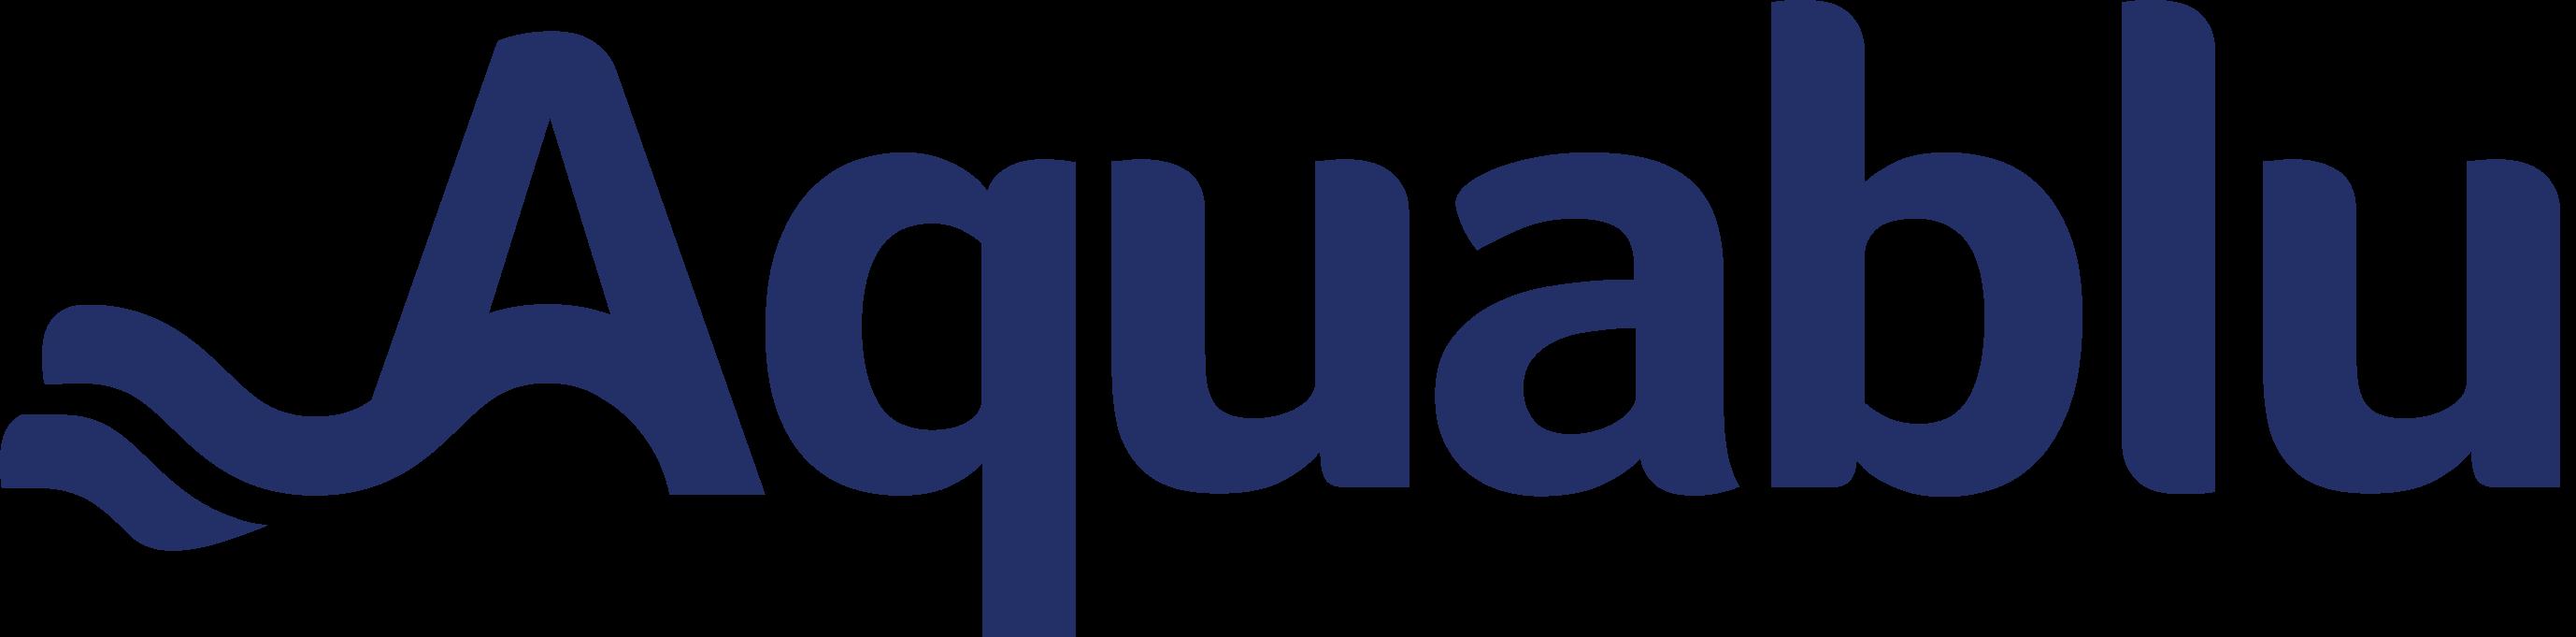 Aquablu is ambassadeur van MADE BLUE en doneert 10.000 liter schoon drinkwater per verkocht filter